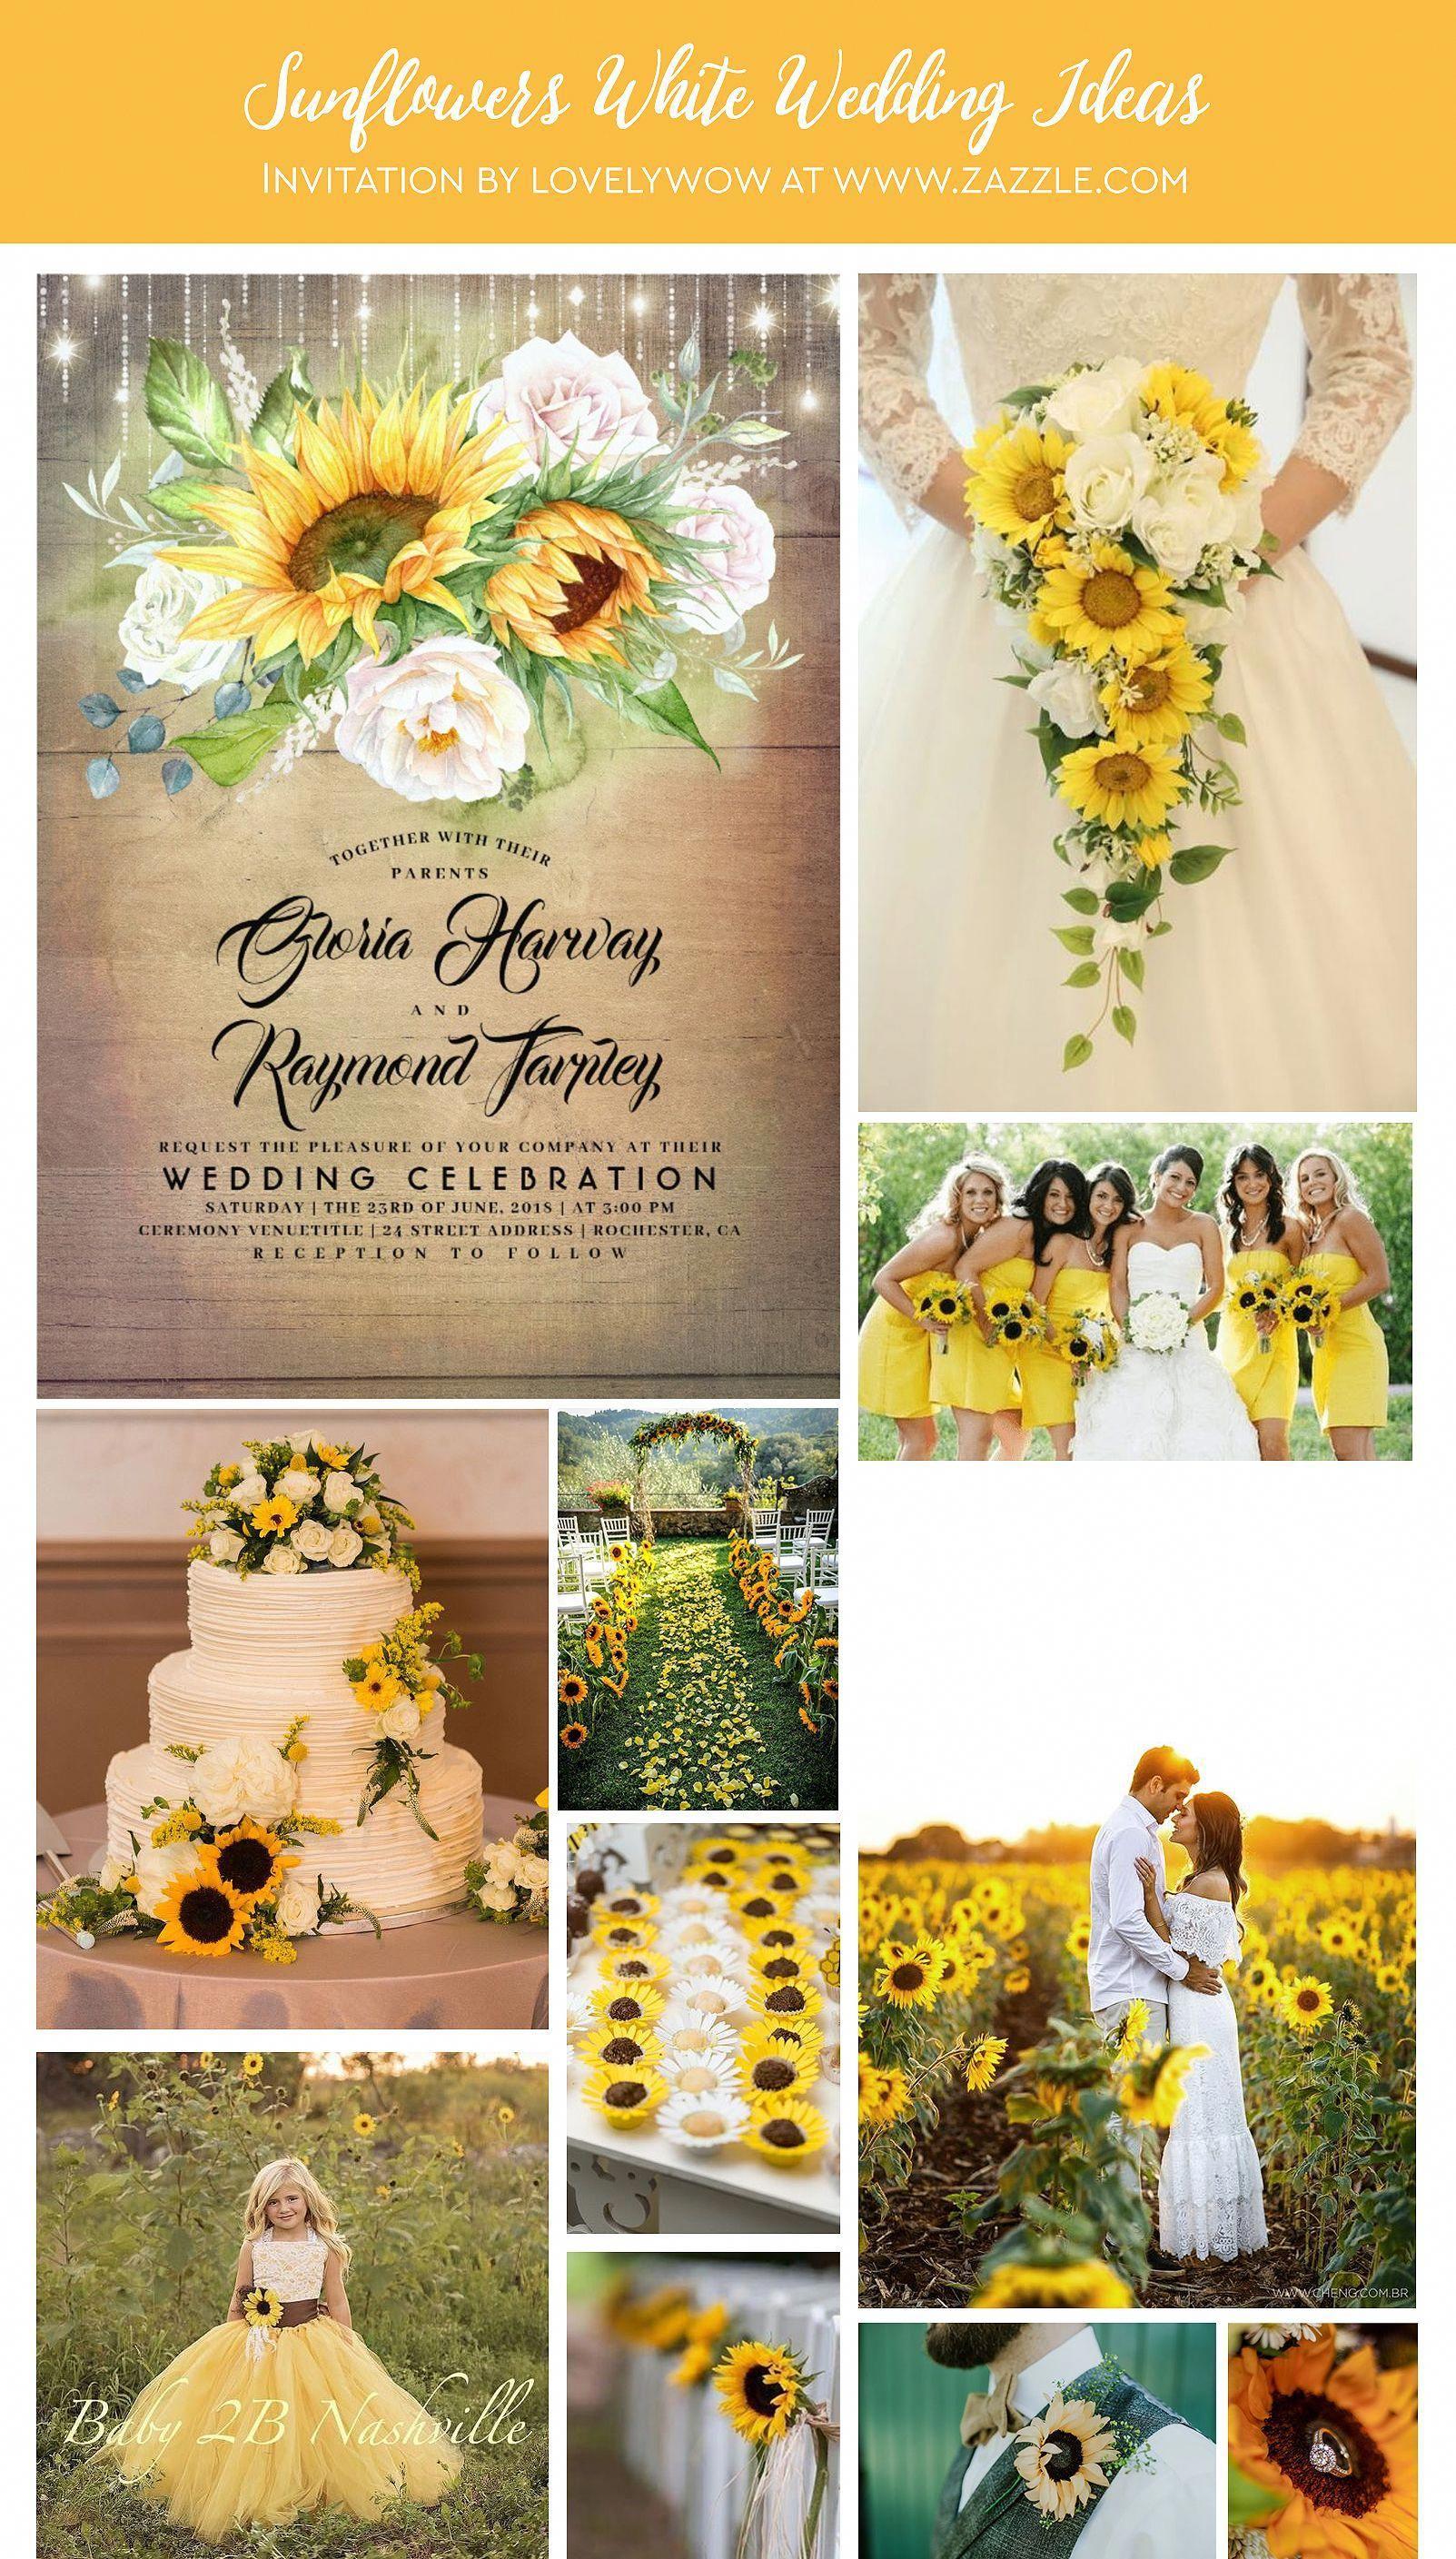 White Rose and Sunflower Rustic Fall Wedding Invitation | Zazzle.com